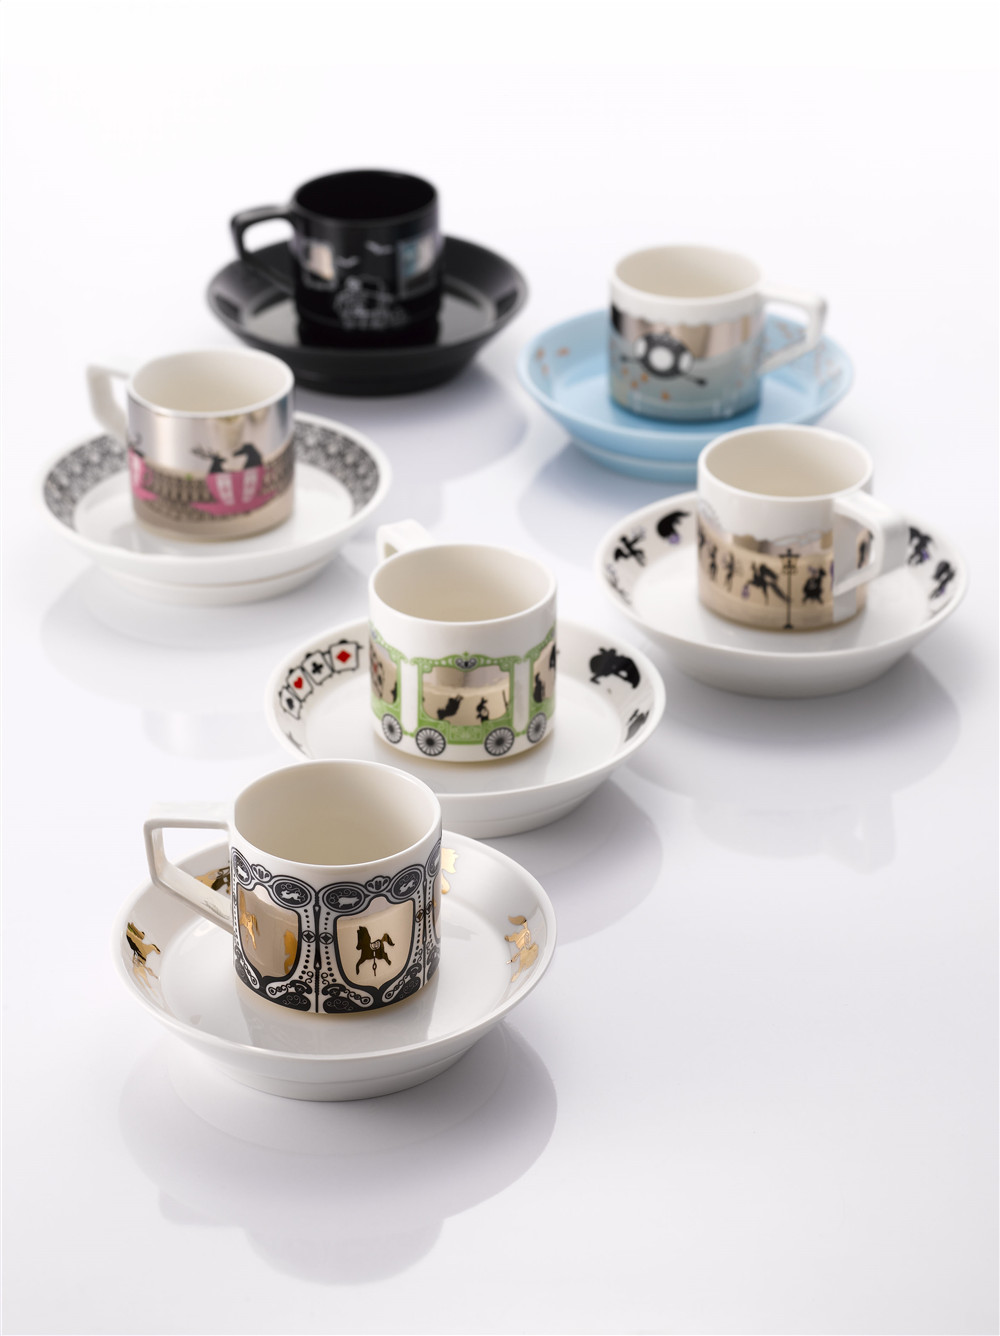 round-round-land-caffee-cup-hisheji (3)